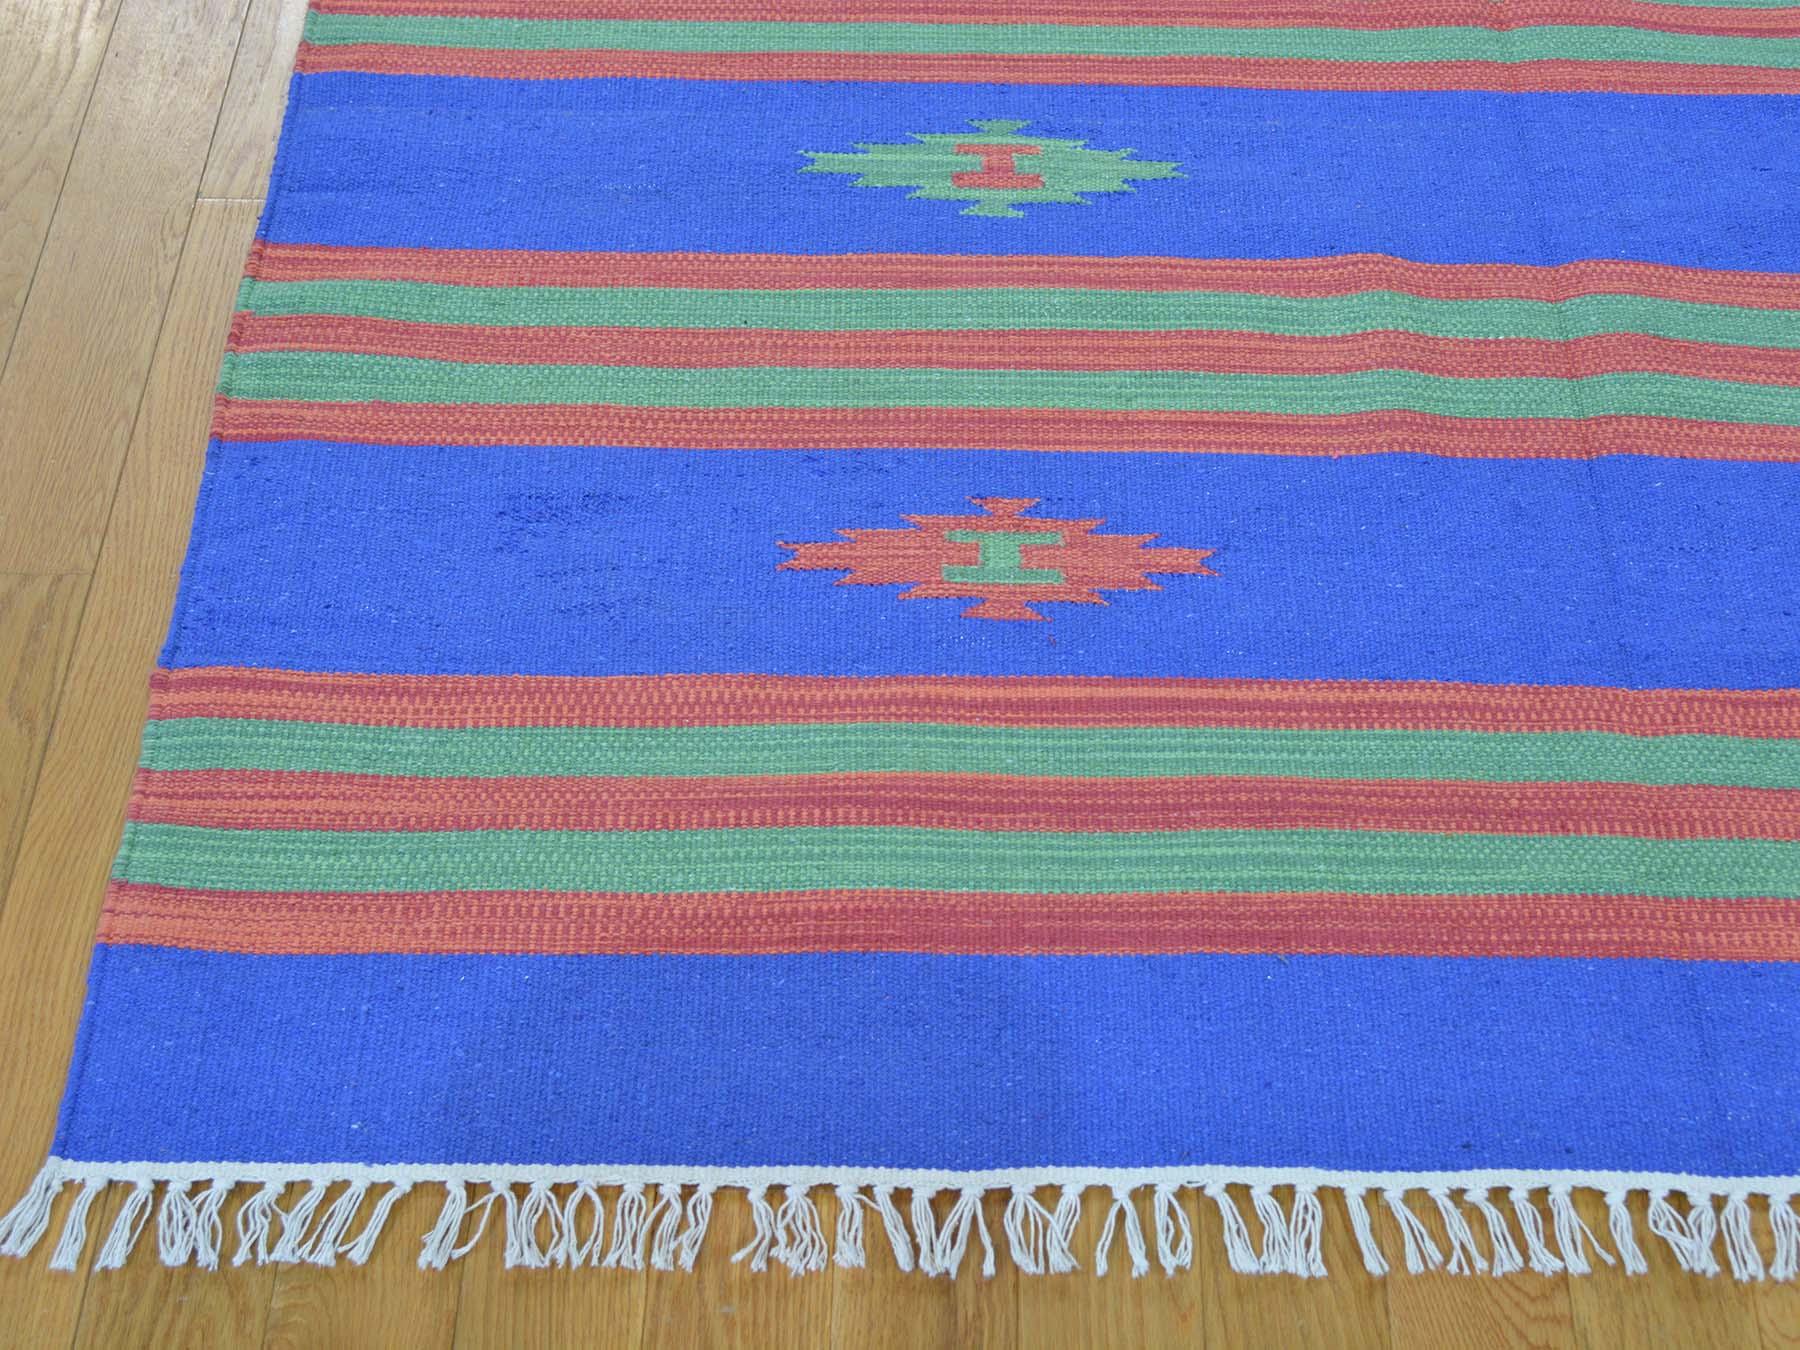 5-1 x7-2  Flat Weave Hand Woven Navajo Design Striped Killim Rug